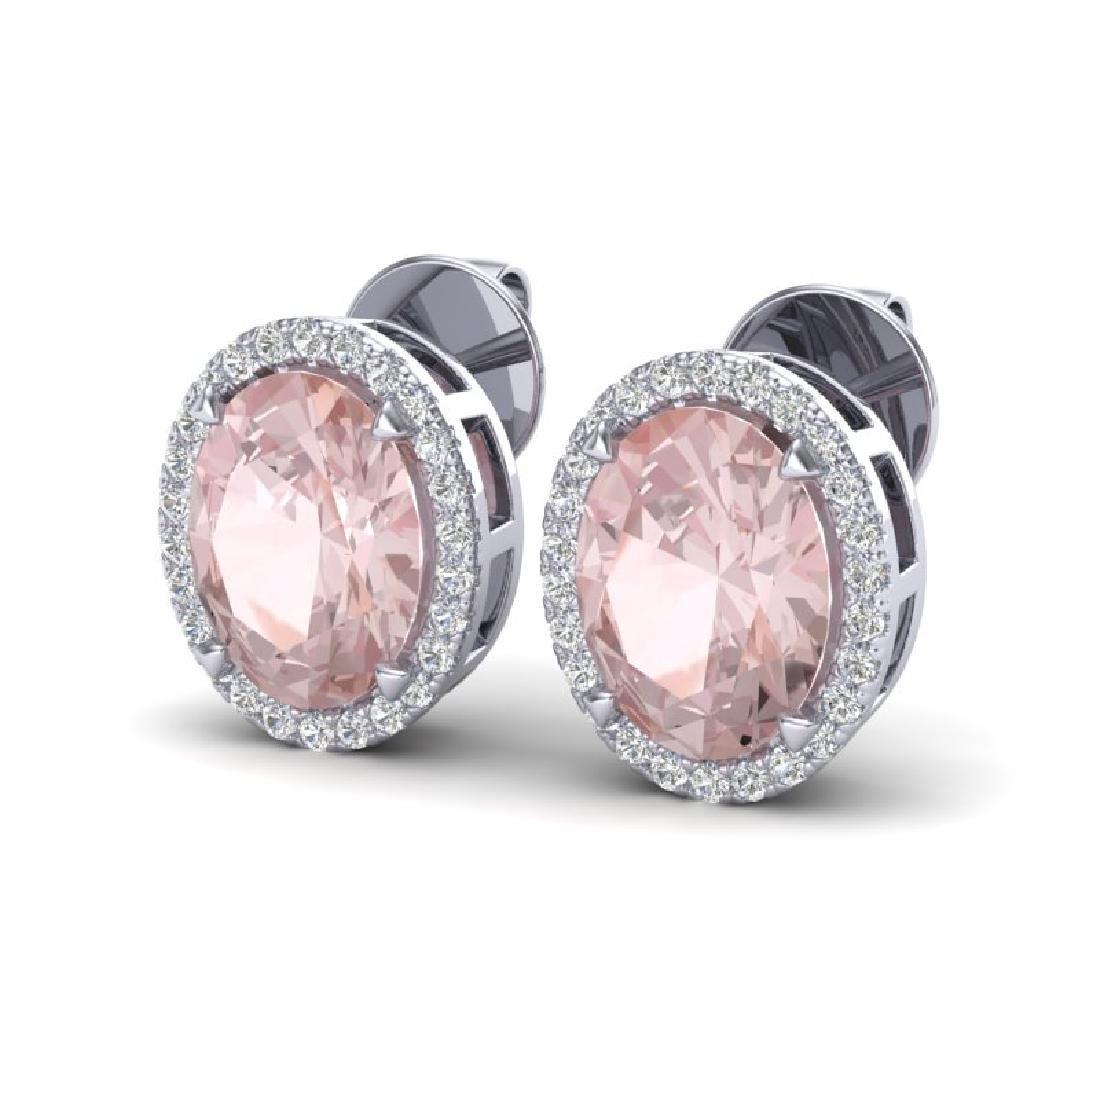 5.50 CTW Morganite & Micro VS/SI Diamond Halo Earrings